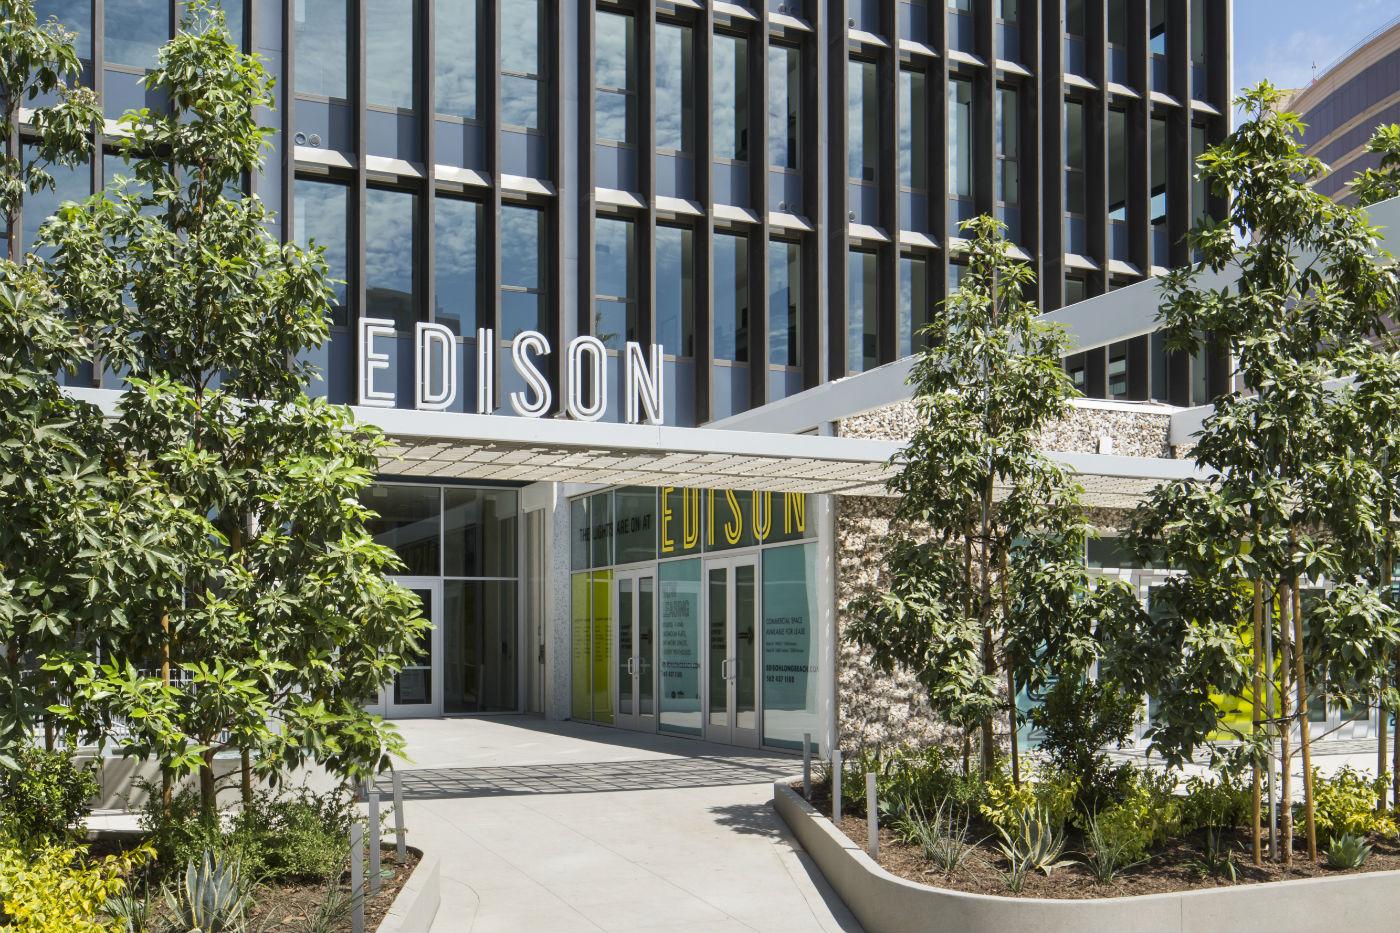 Edison Long Beach